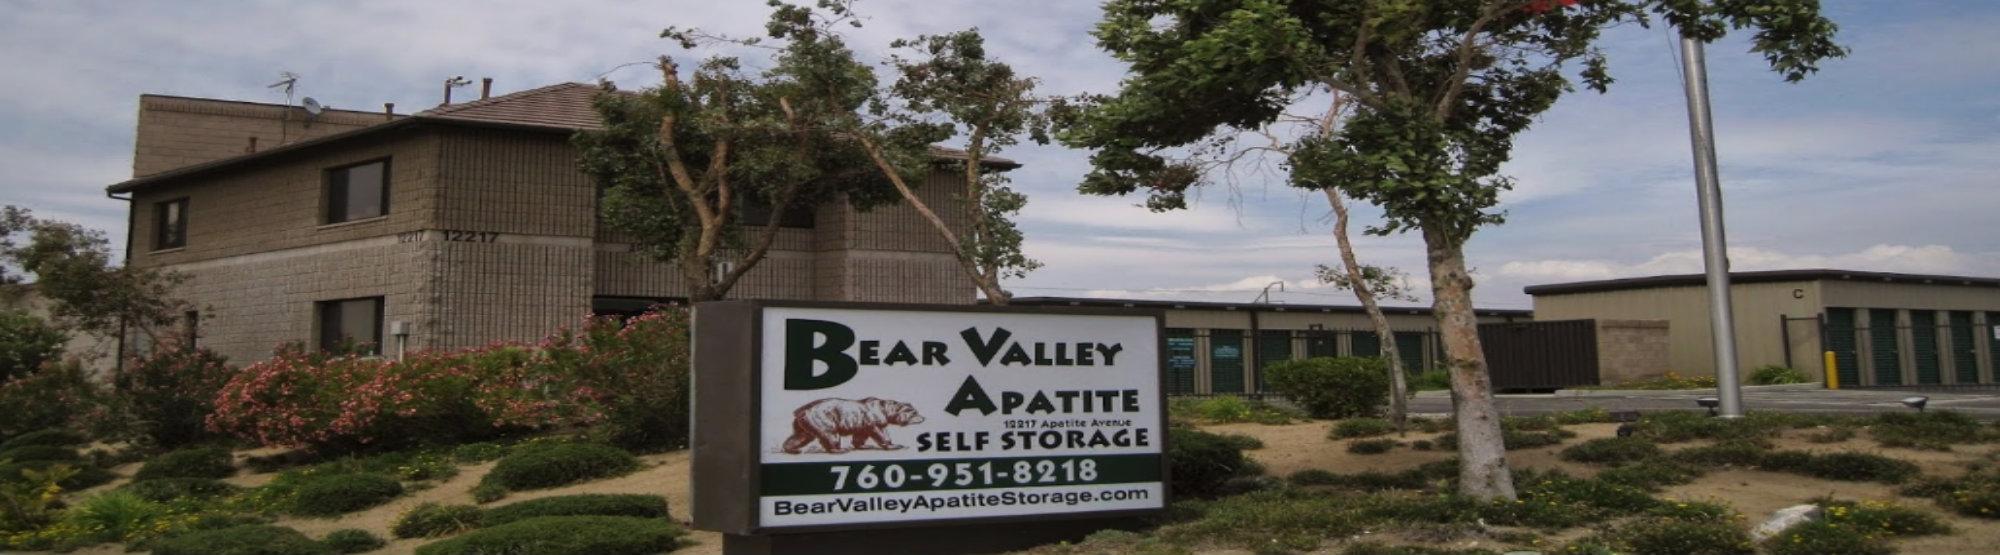 Bear Valley Self Storage